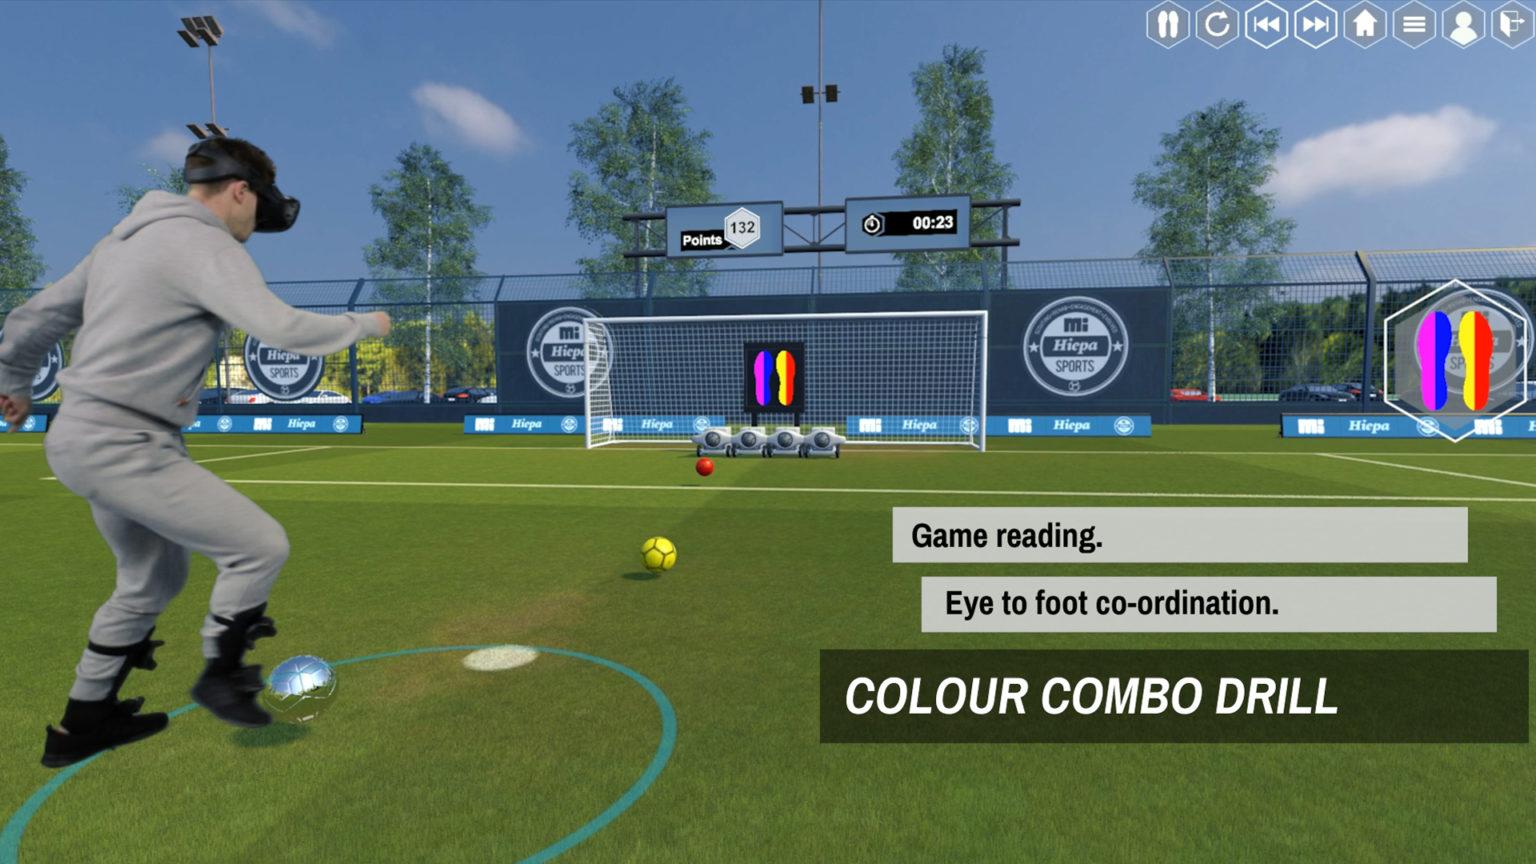 VR与电竞相结合,将帮助训练出下一代足球巨星!